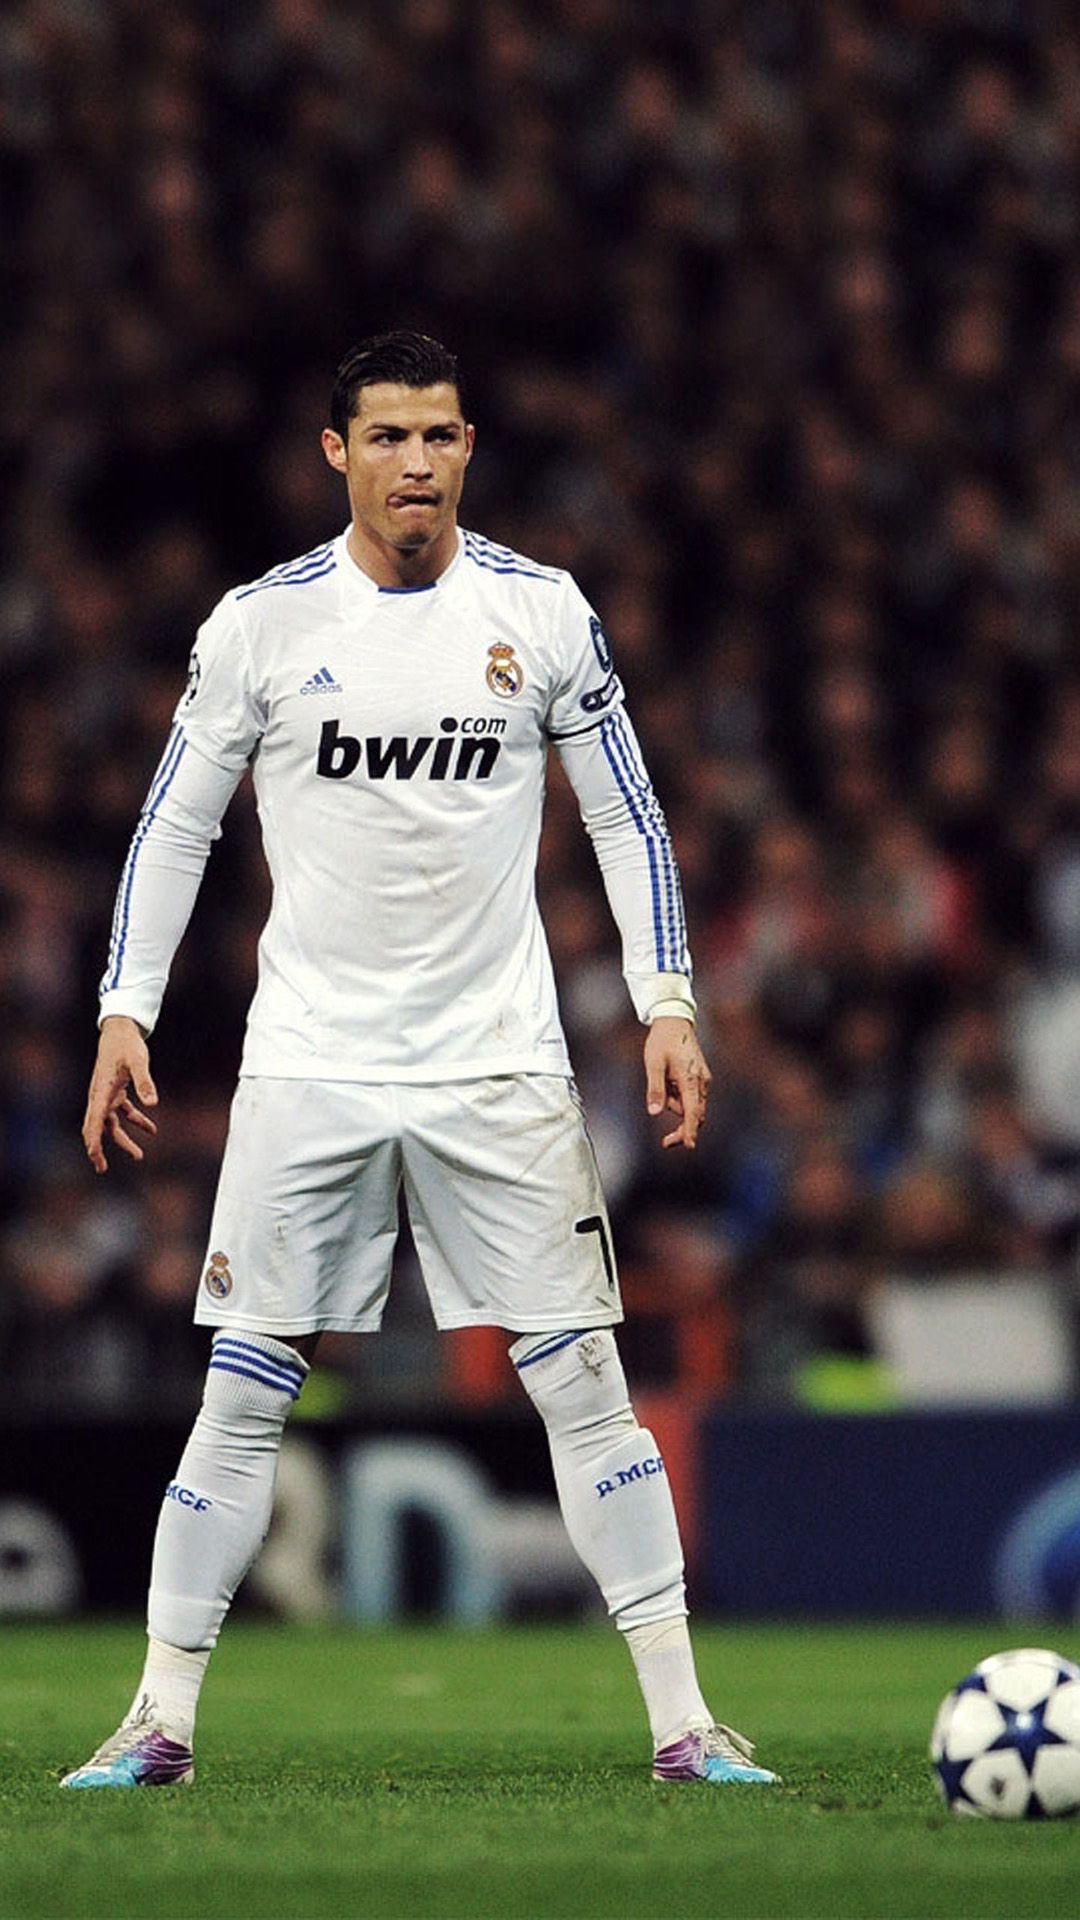 Hd wallpaper ronaldo - Ultra Hd K Cristiano Ronaldo Wallpapers Hd Desktop Backgrounds